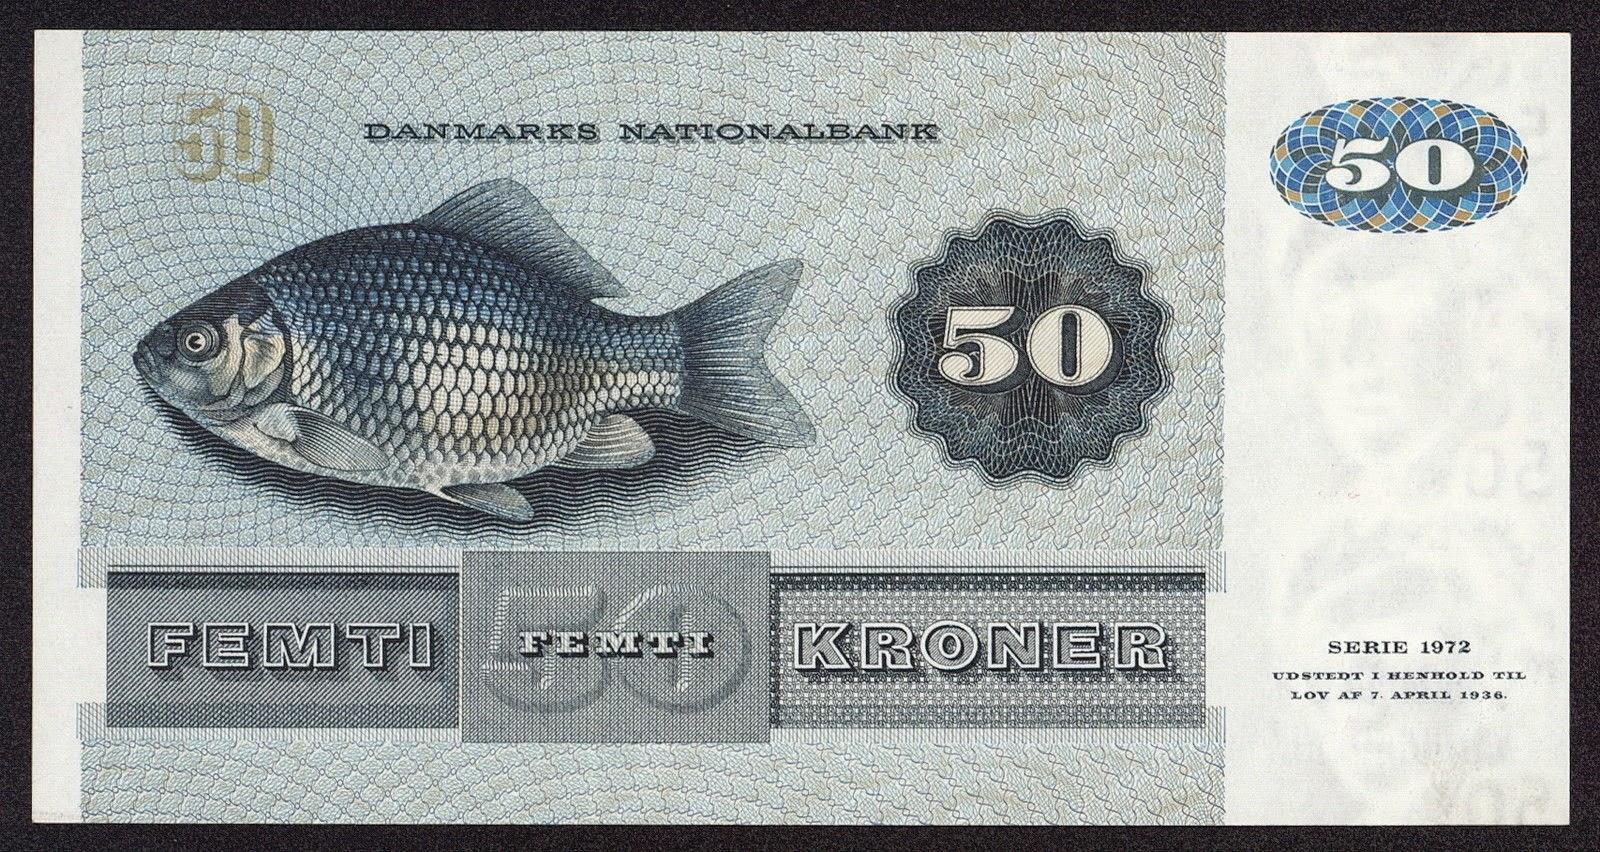 50 Danish Kroner note 1972 Crucian carp